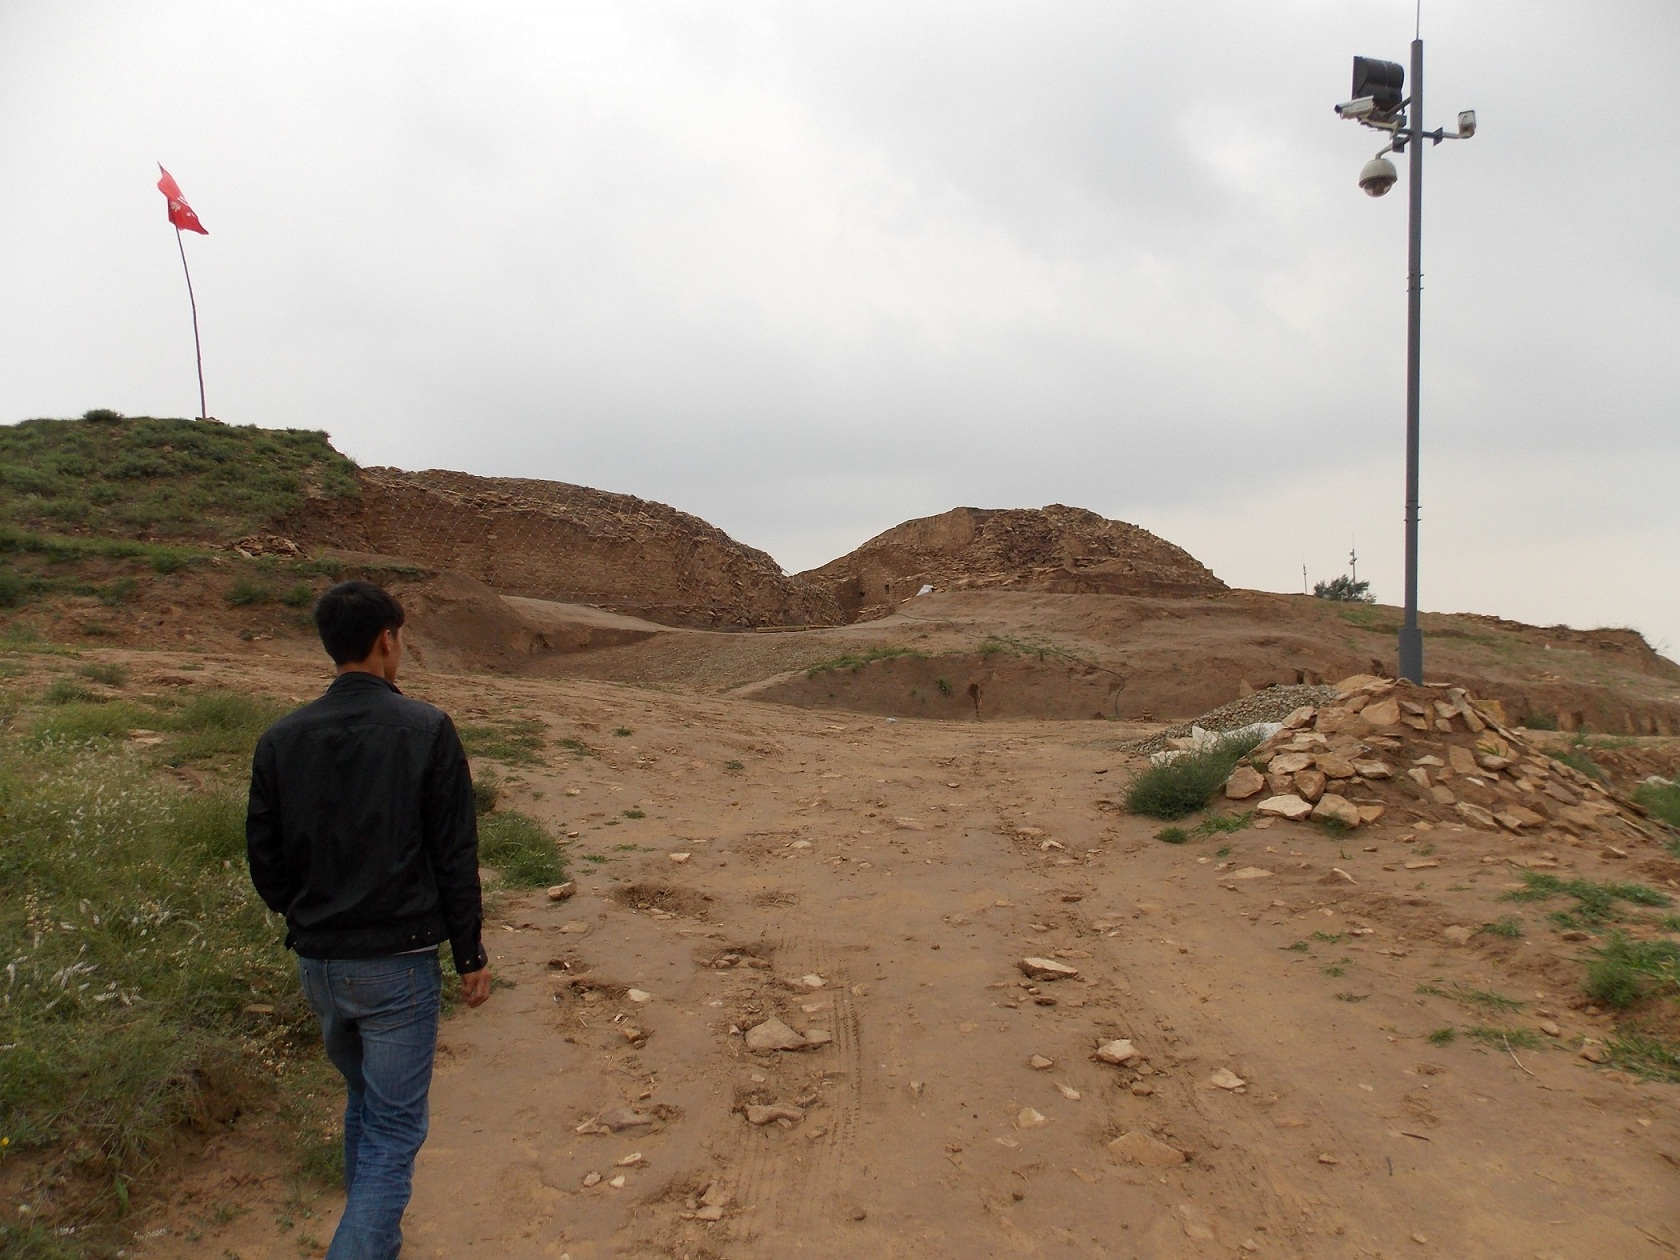 A-Xia-abnormal-culture-ruins-I.jpg